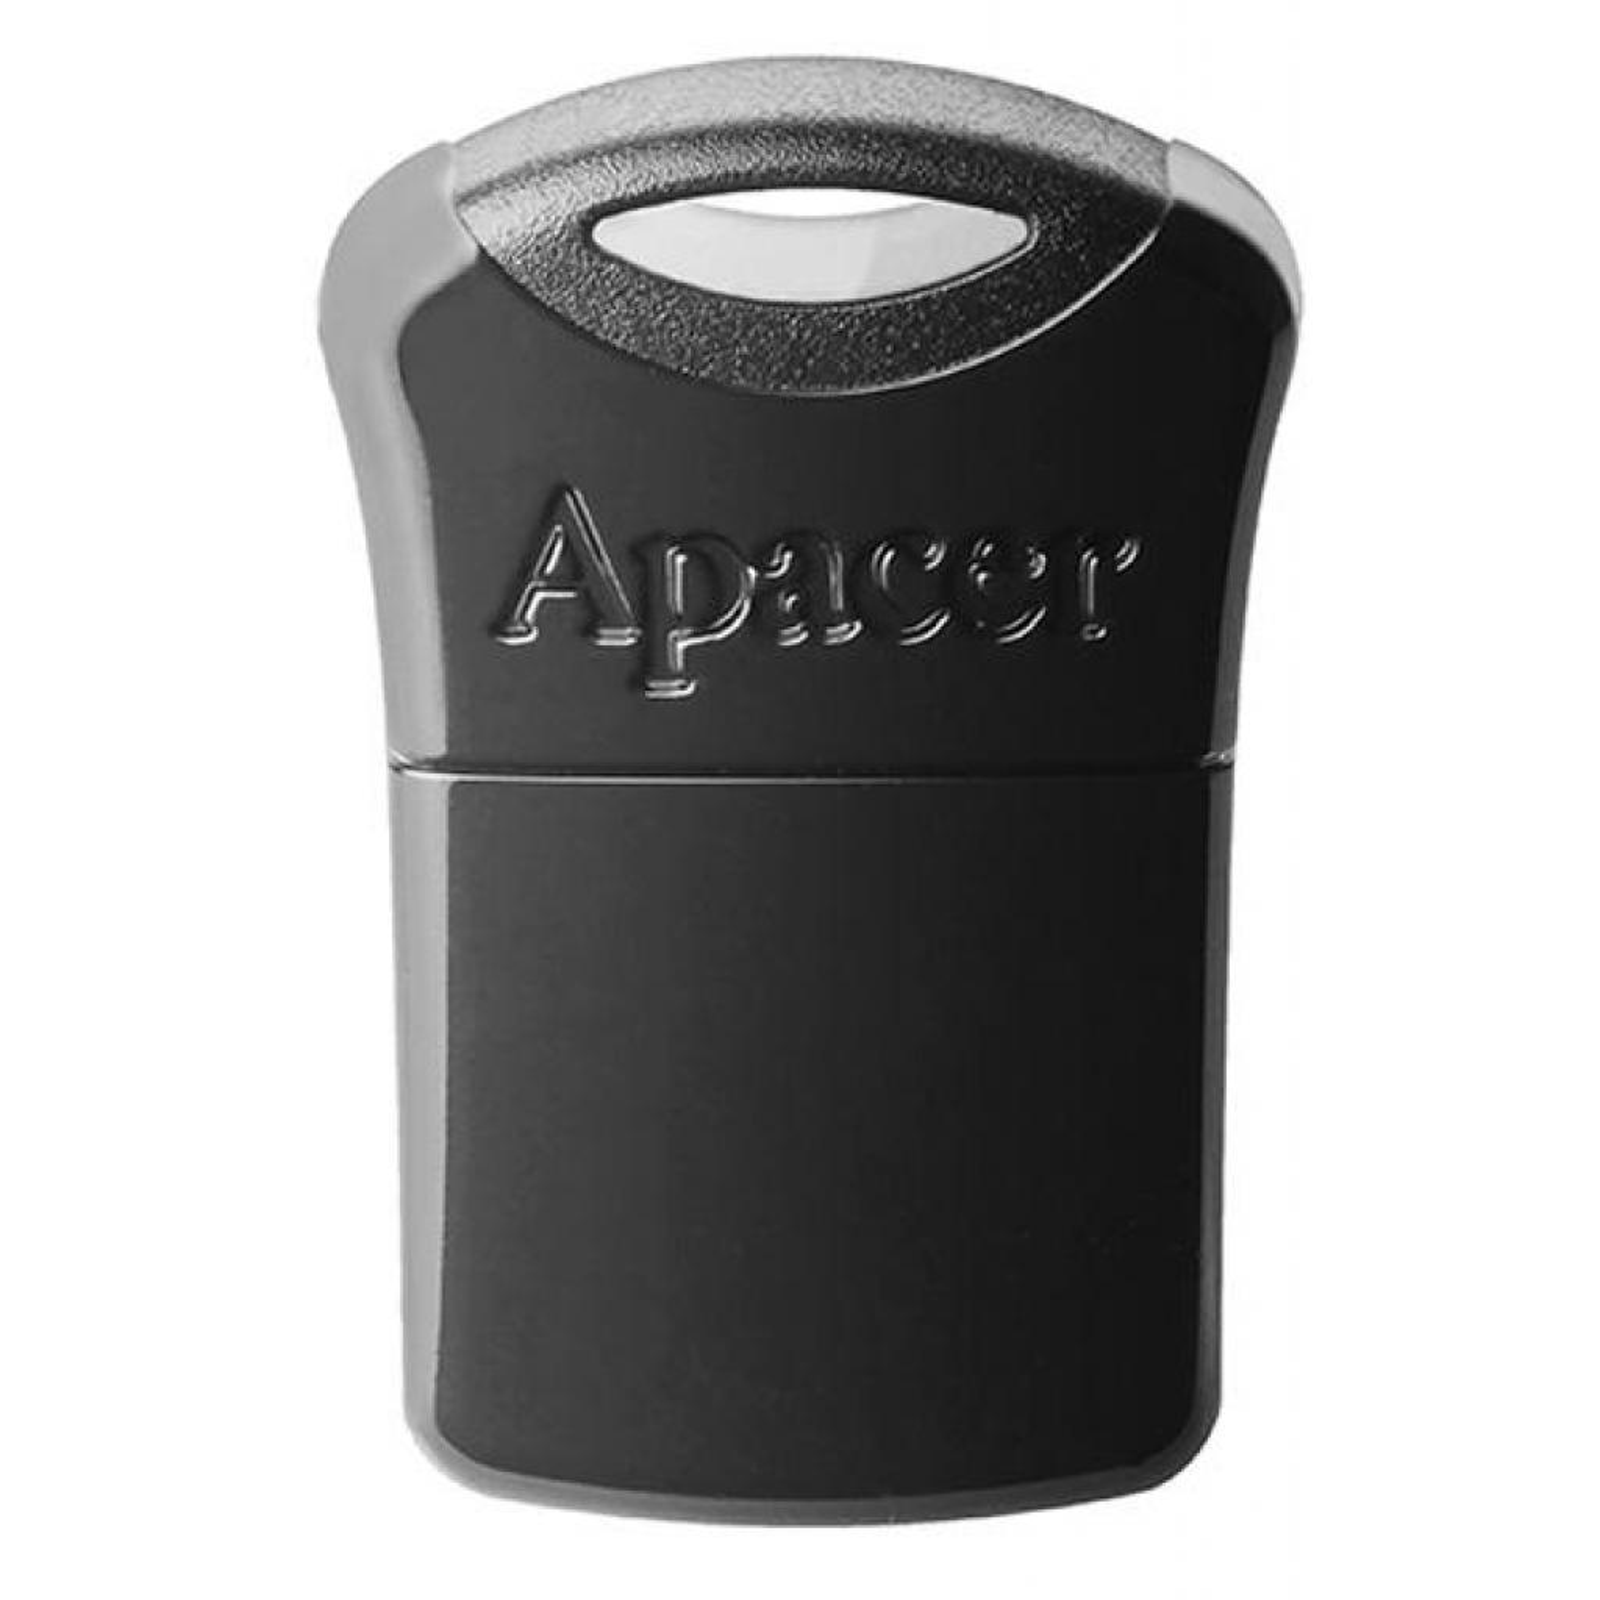 USB флеш накопитель Apacer 32GB AH116 Black USB 2.0 (AP32GAH116B-1) изображение 2